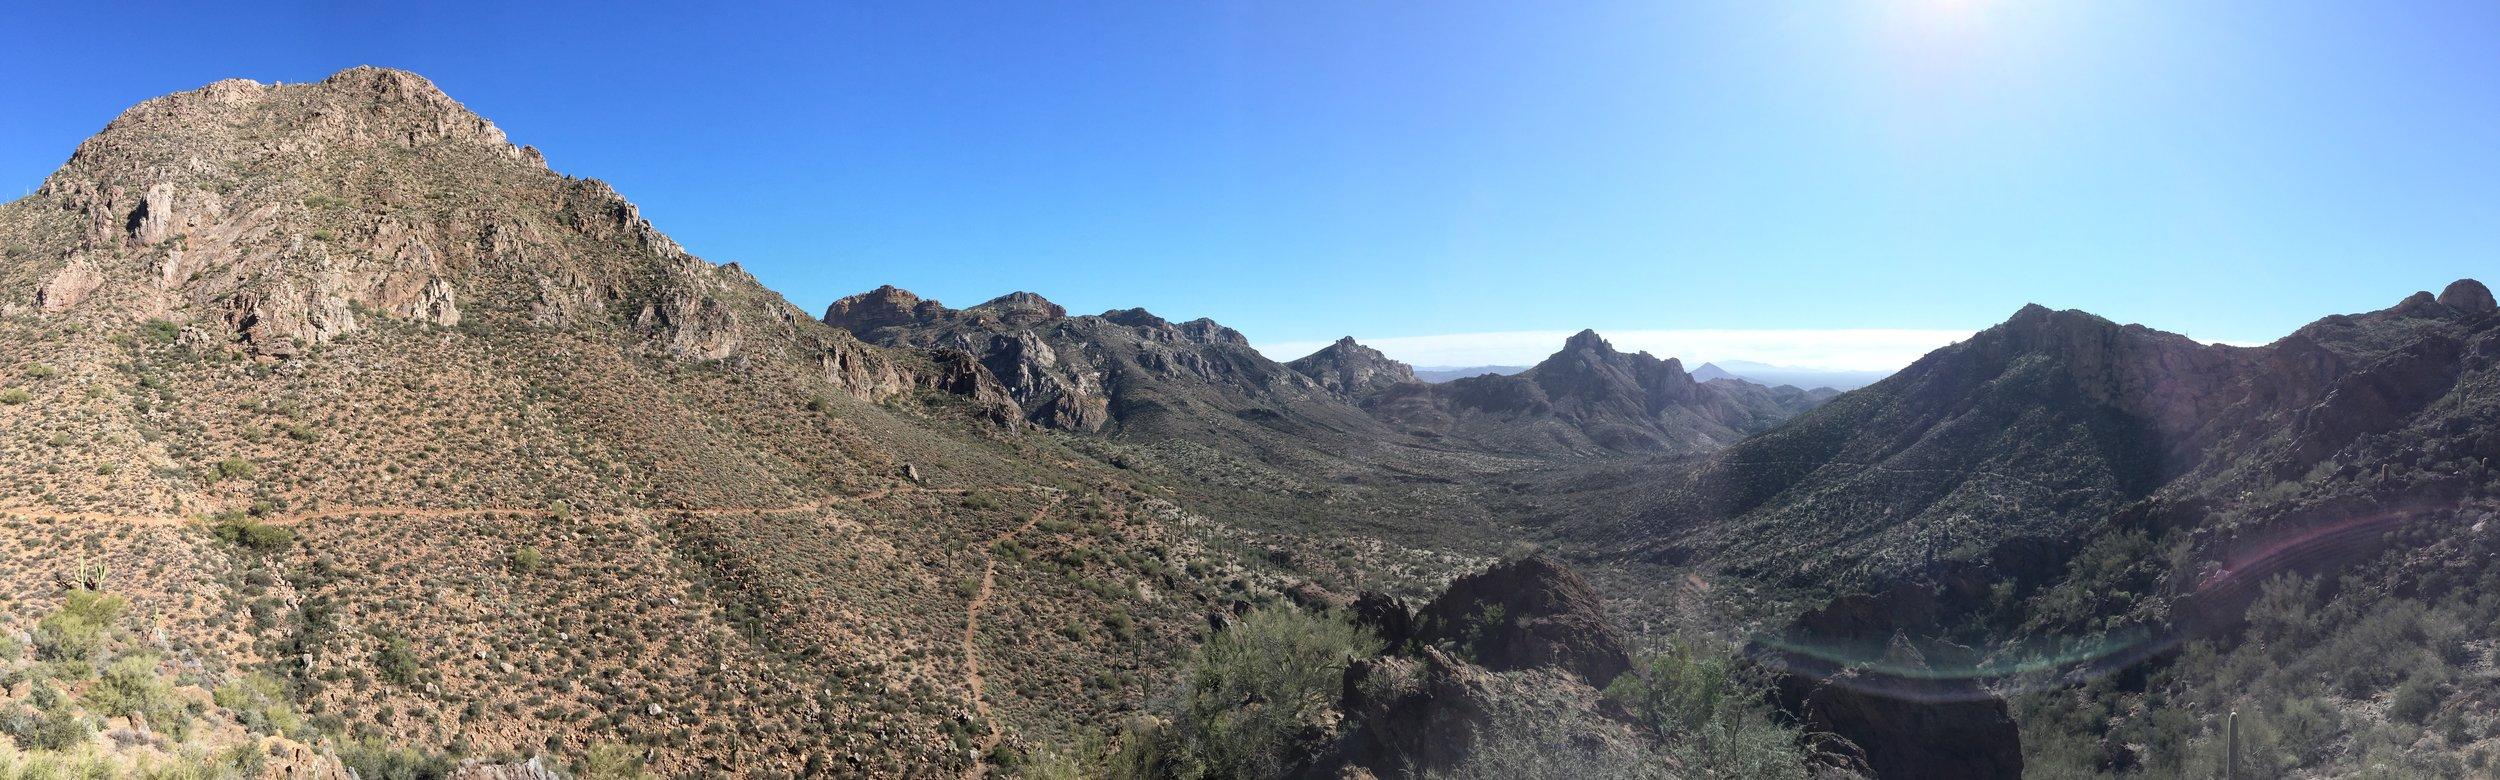 Trails scratched through the desert wilderness